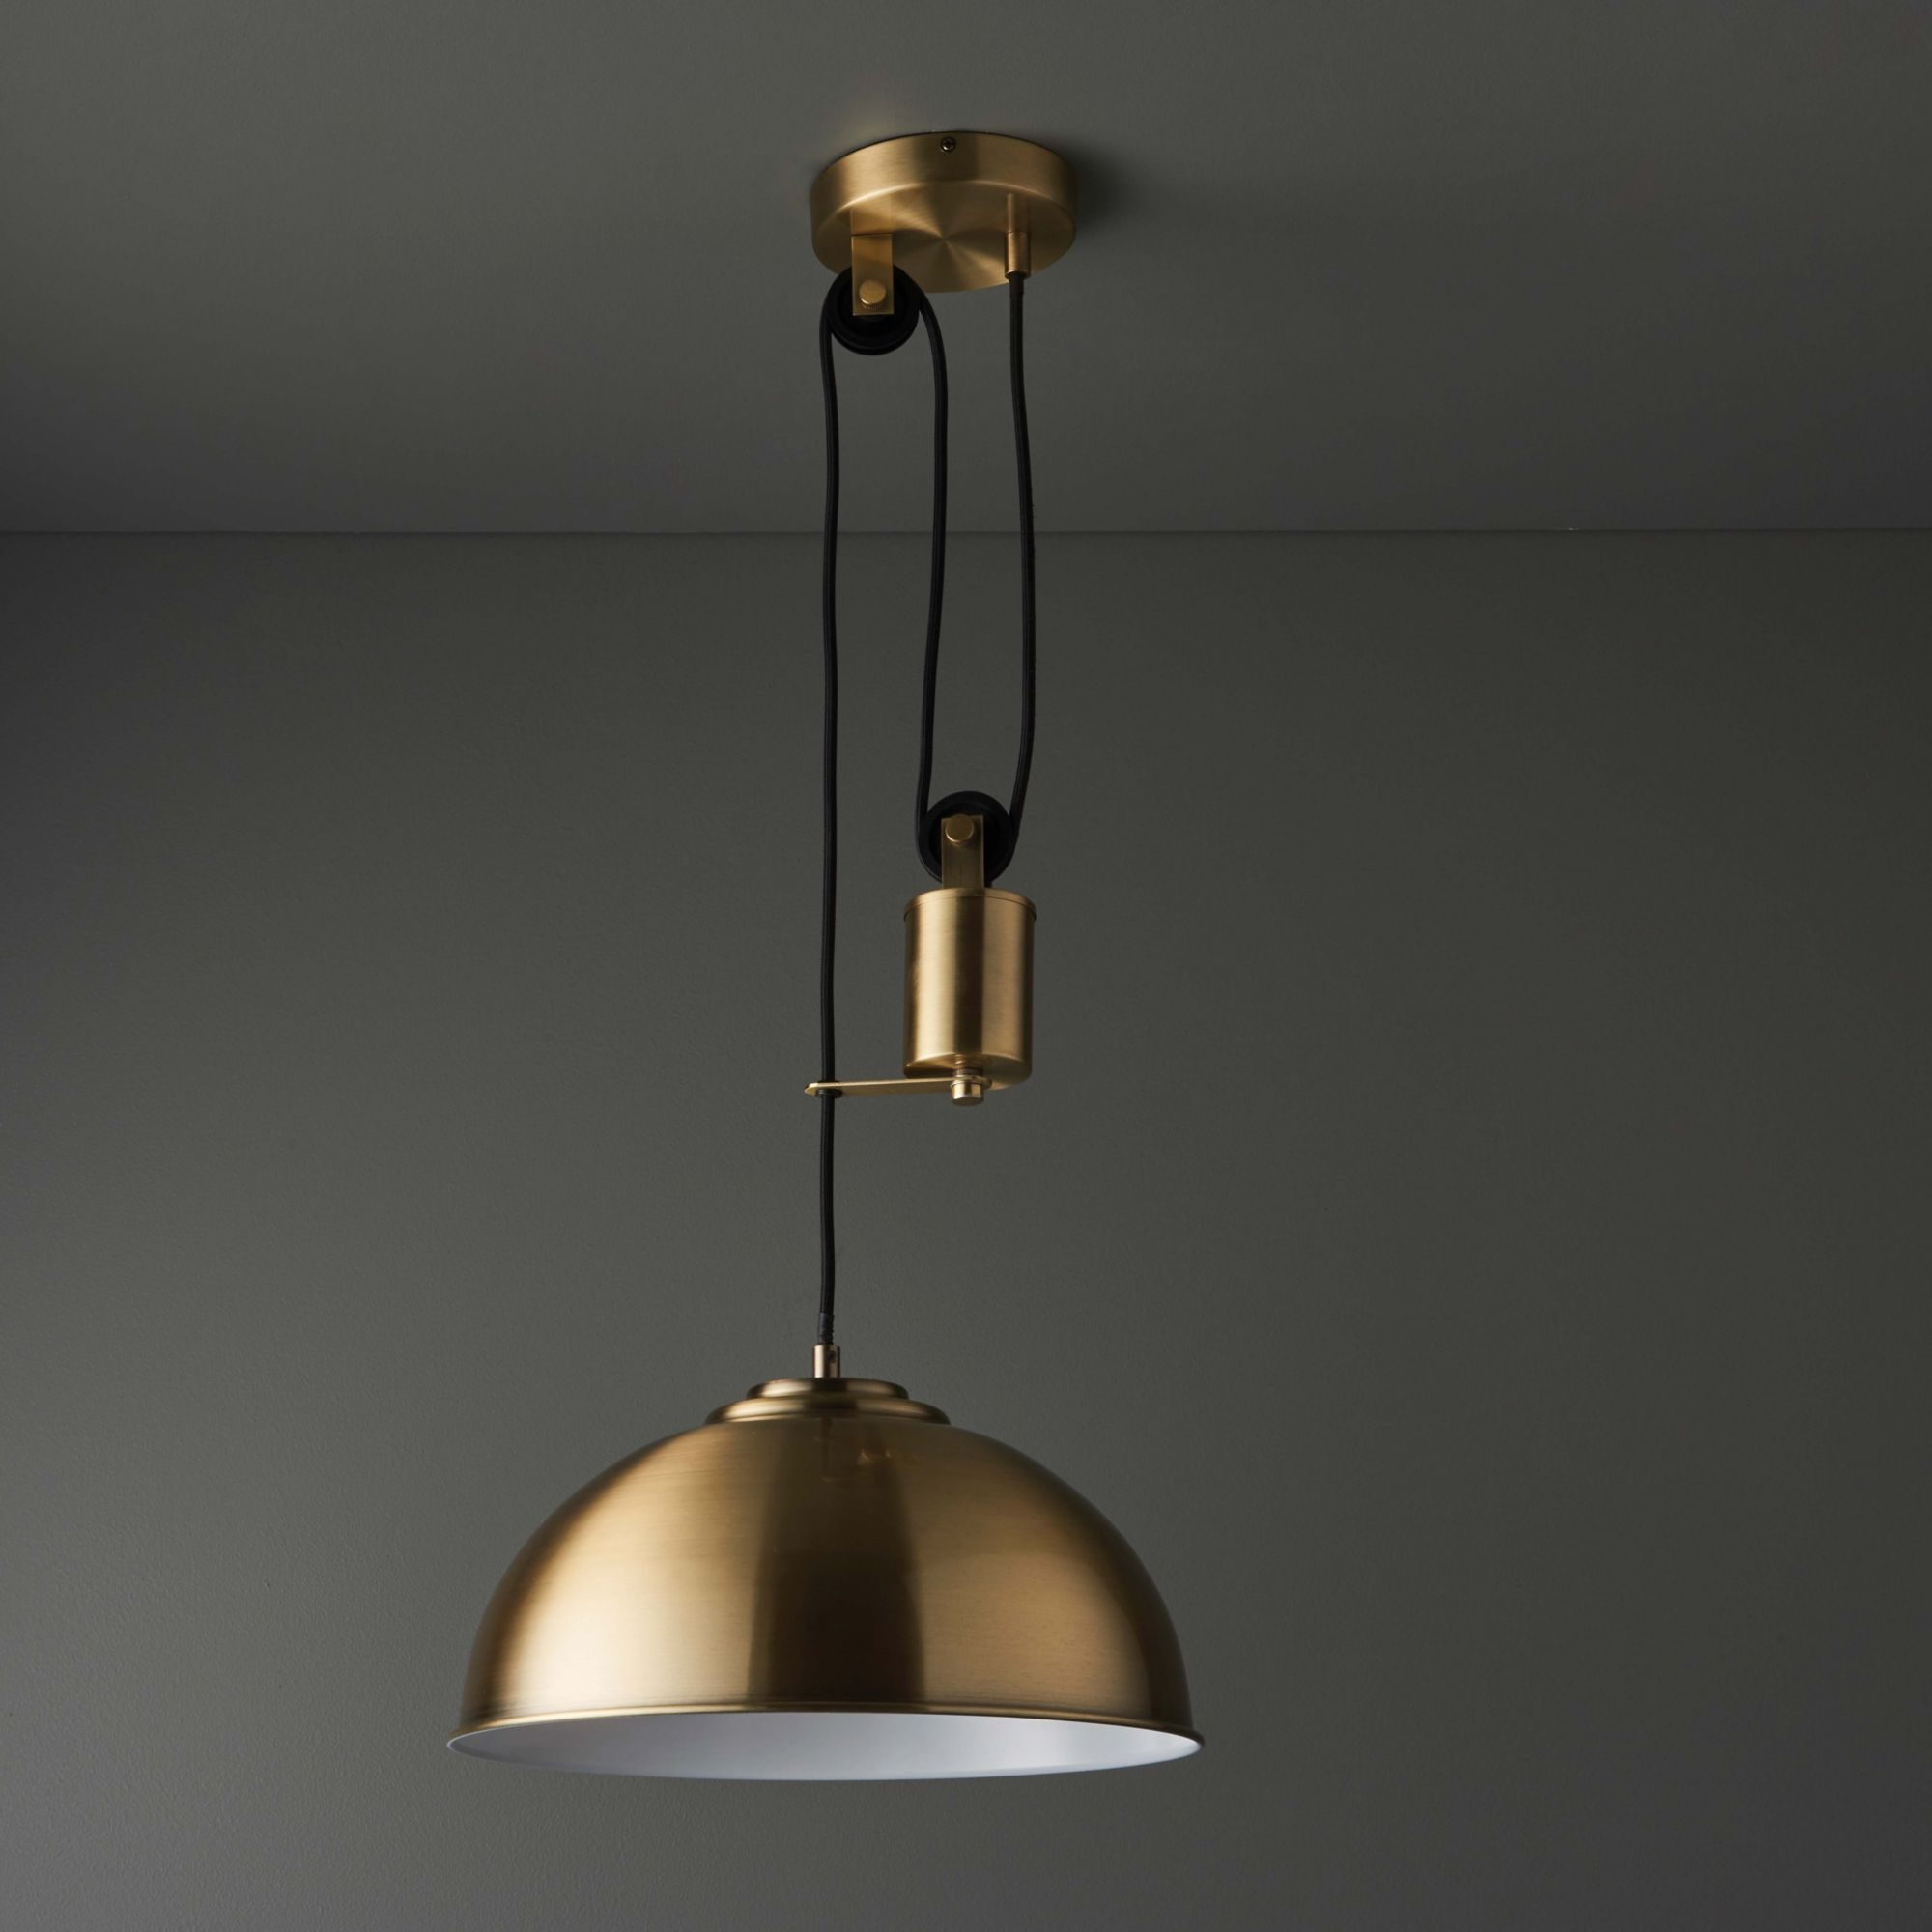 Ragner Antique Brass Effect Pendant Ceiling Lightwarm White Ceiling Lights Diy Ceiling Lights Ceiling Pendant Lights